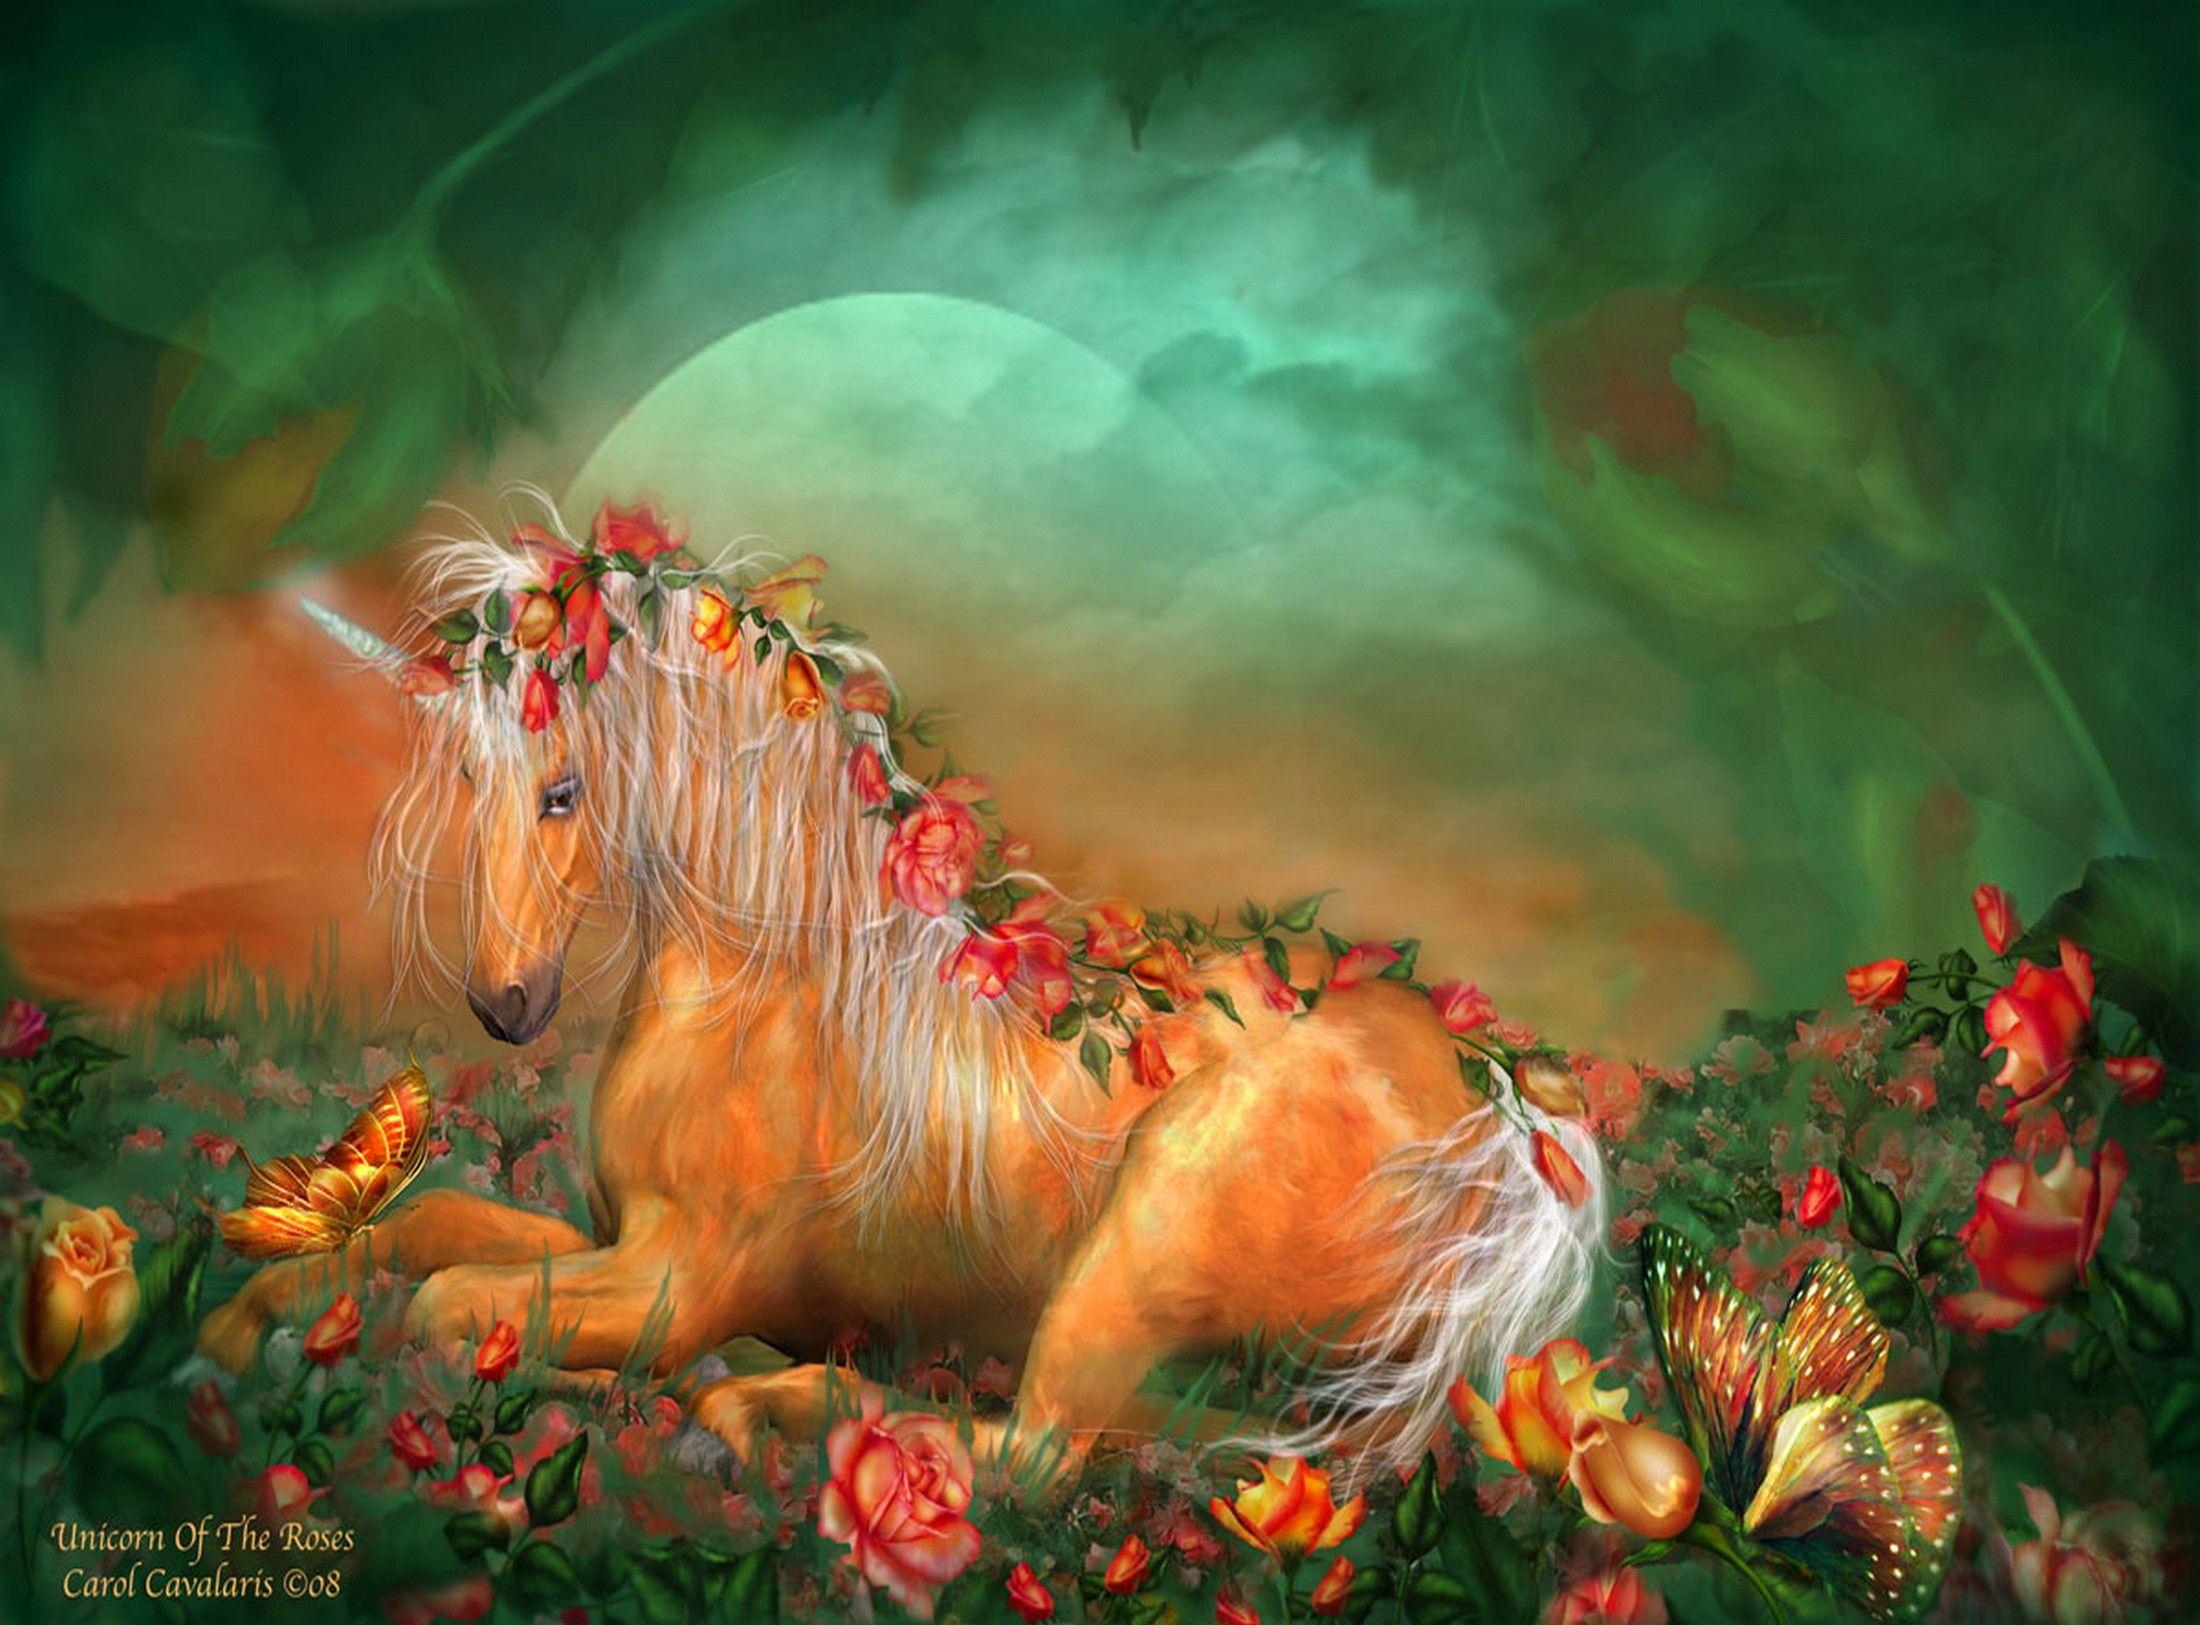 Best Wallpaper Horse Unicorn - 00088bd199a070499bc03fa3dbb3cf5f  Pic_288495.jpg